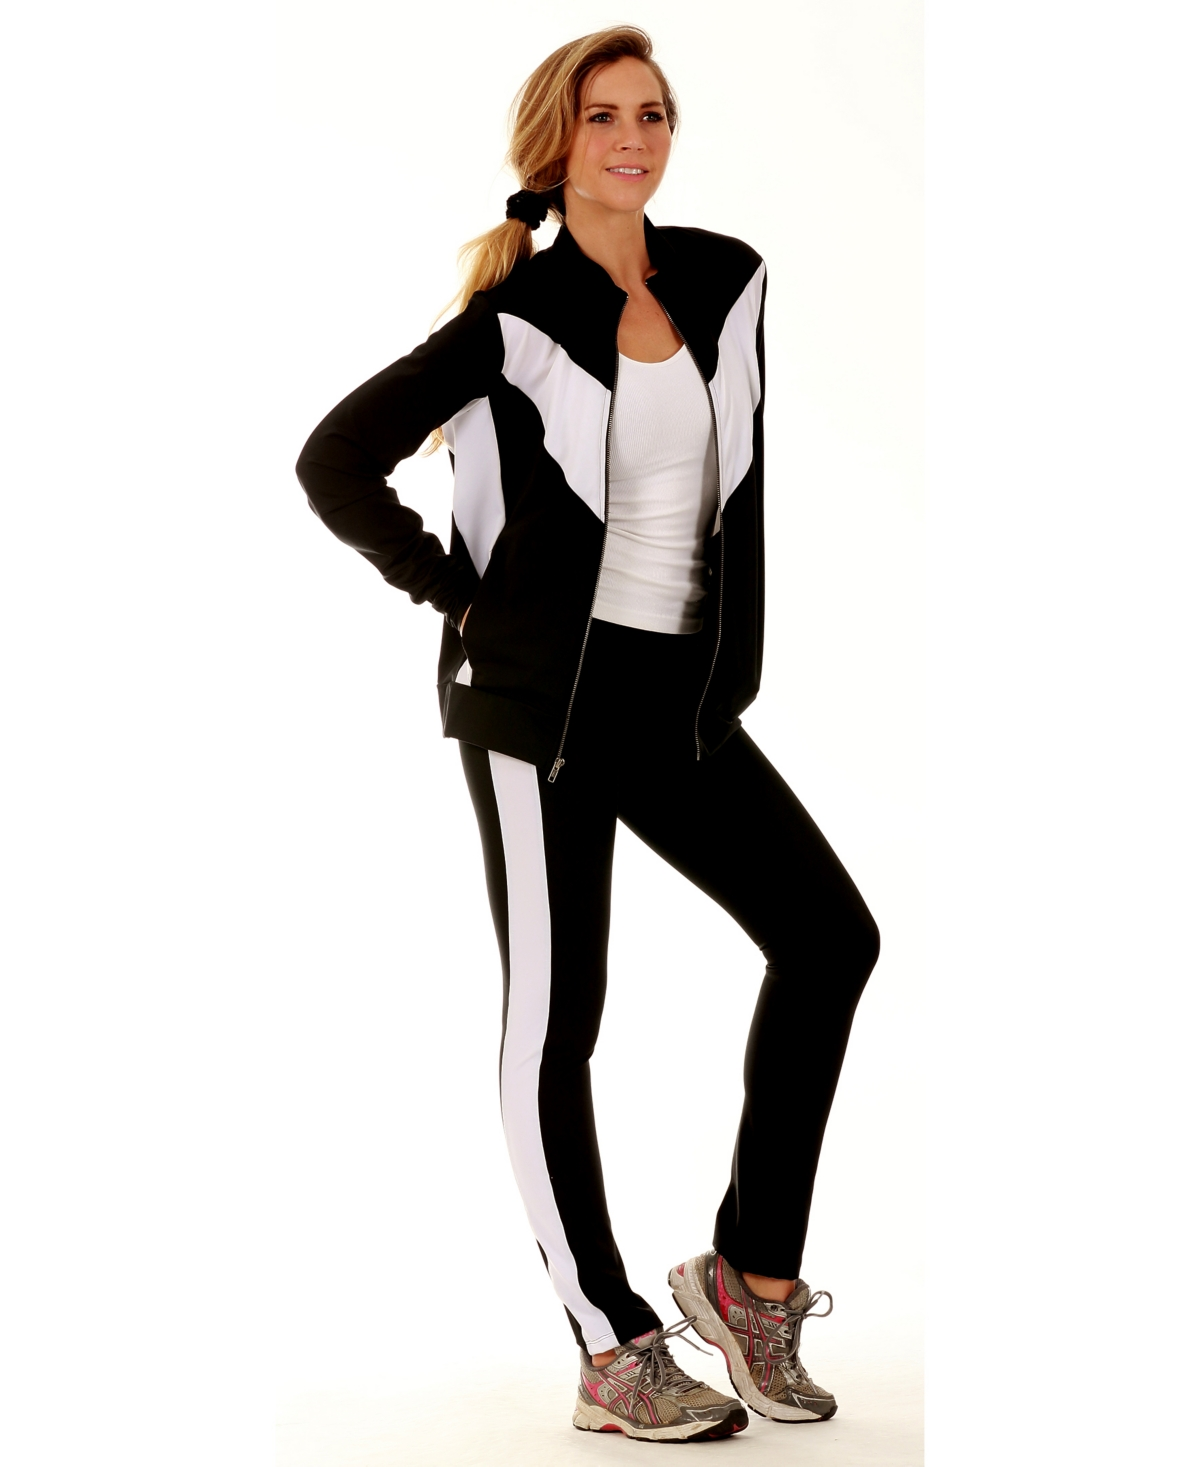 InstantFigure Activewear Compression Leggings